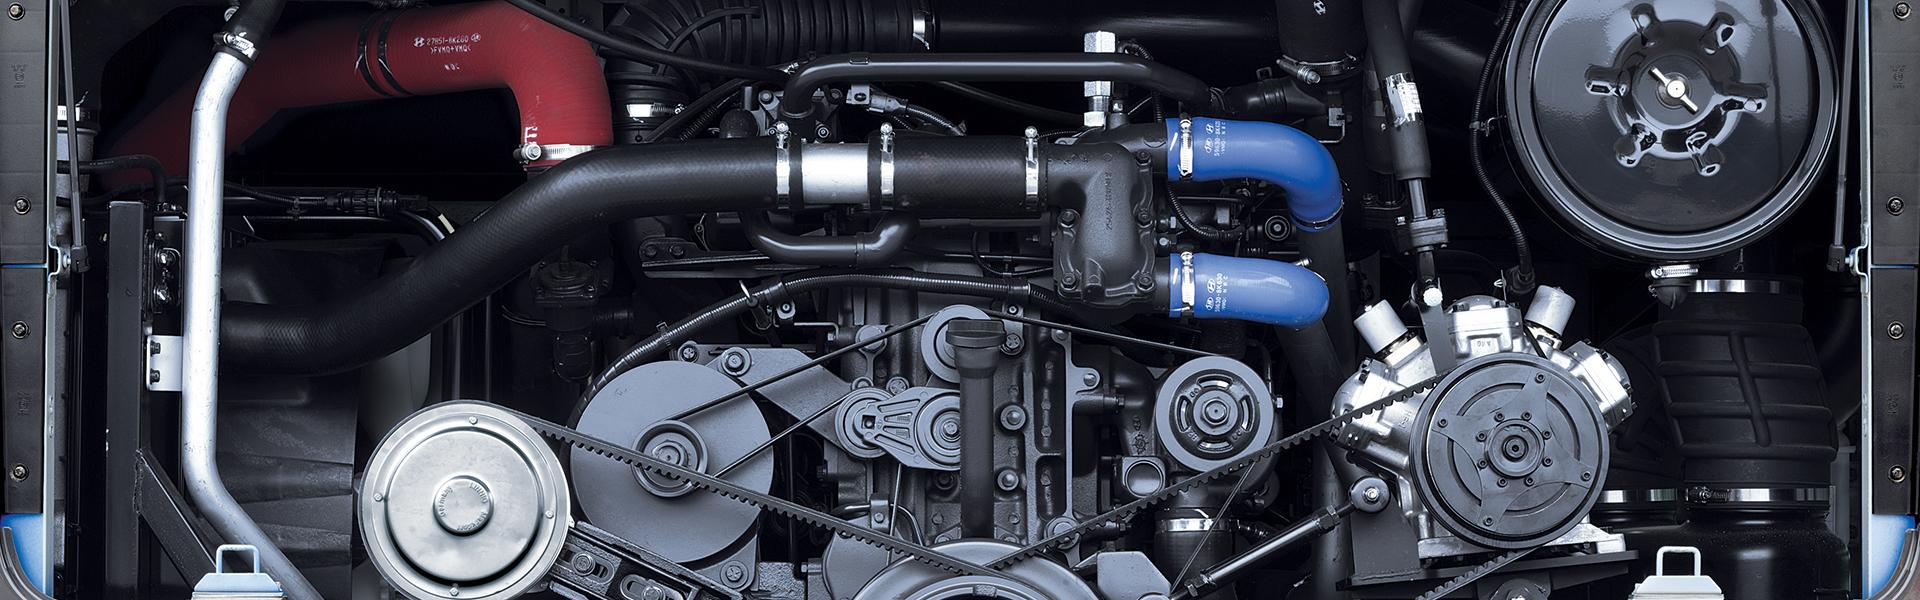 Engine Room Layout (Diesel Engine)